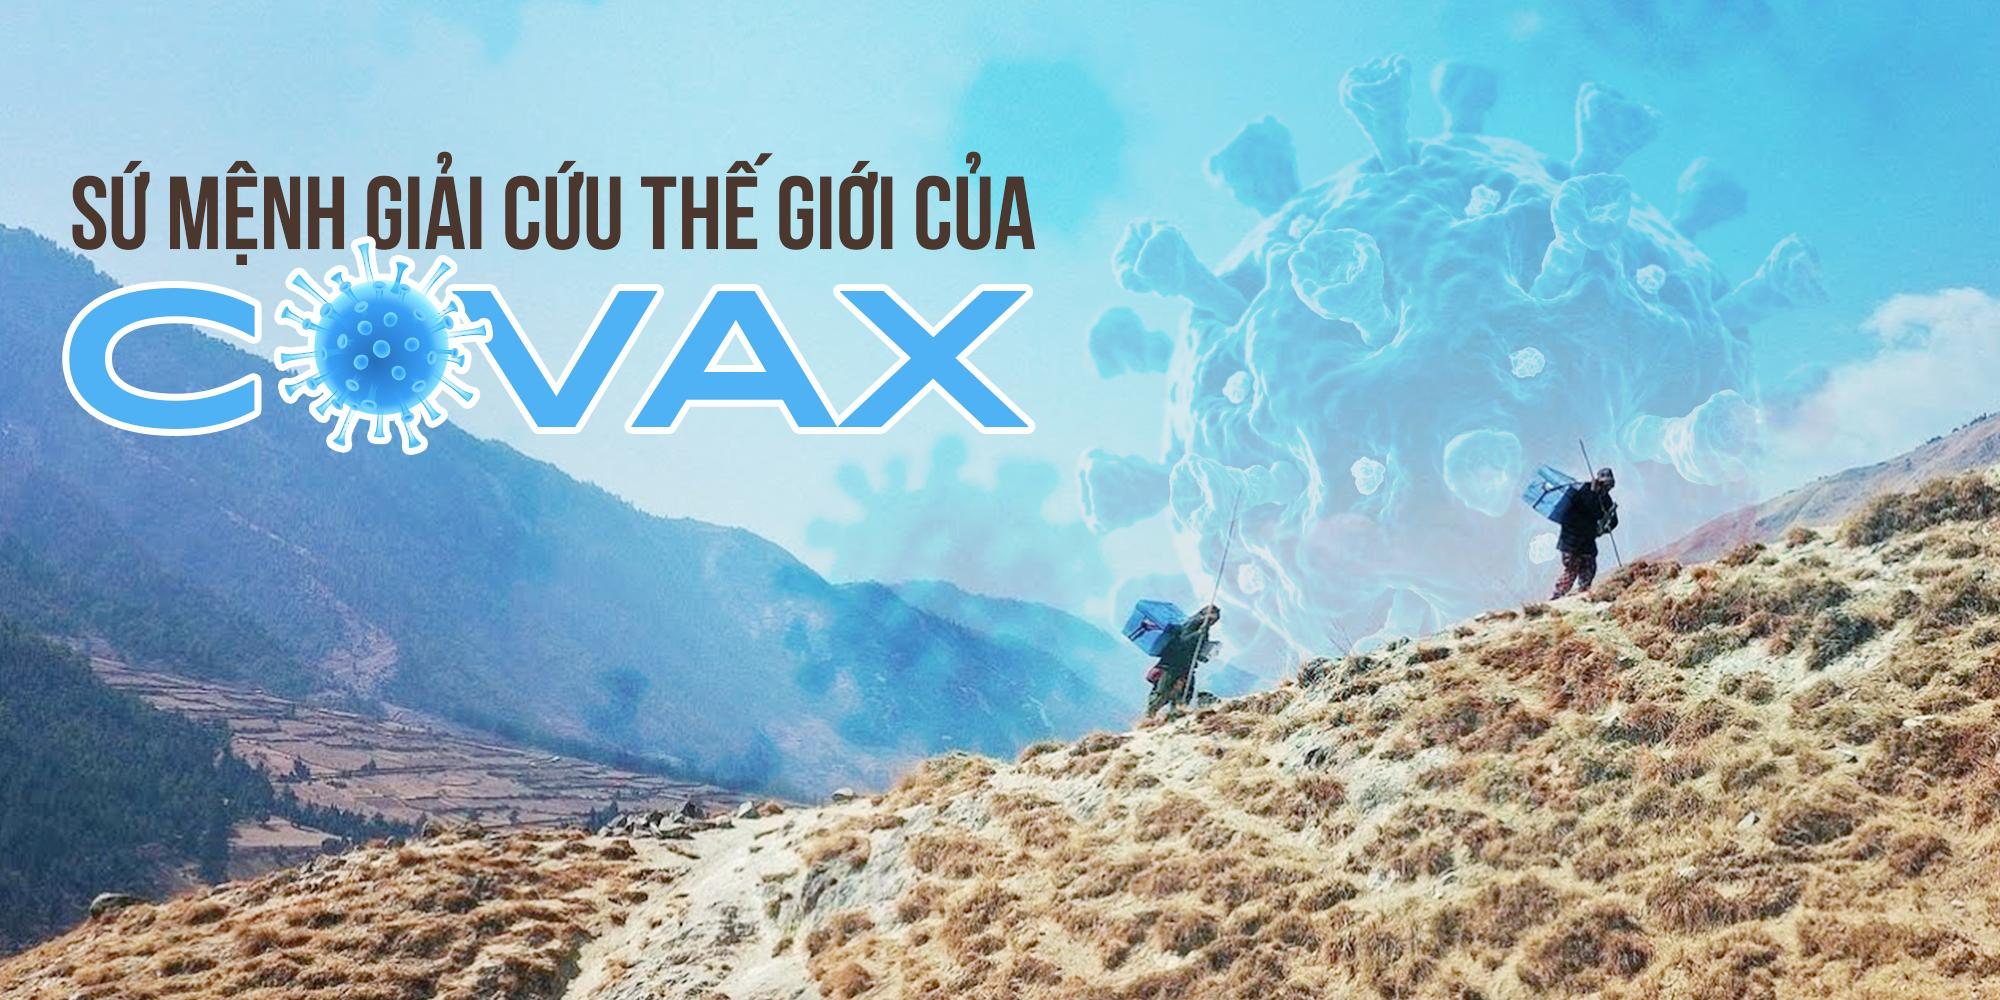 Sứ mệnh giải cứu thế giới của COVAX